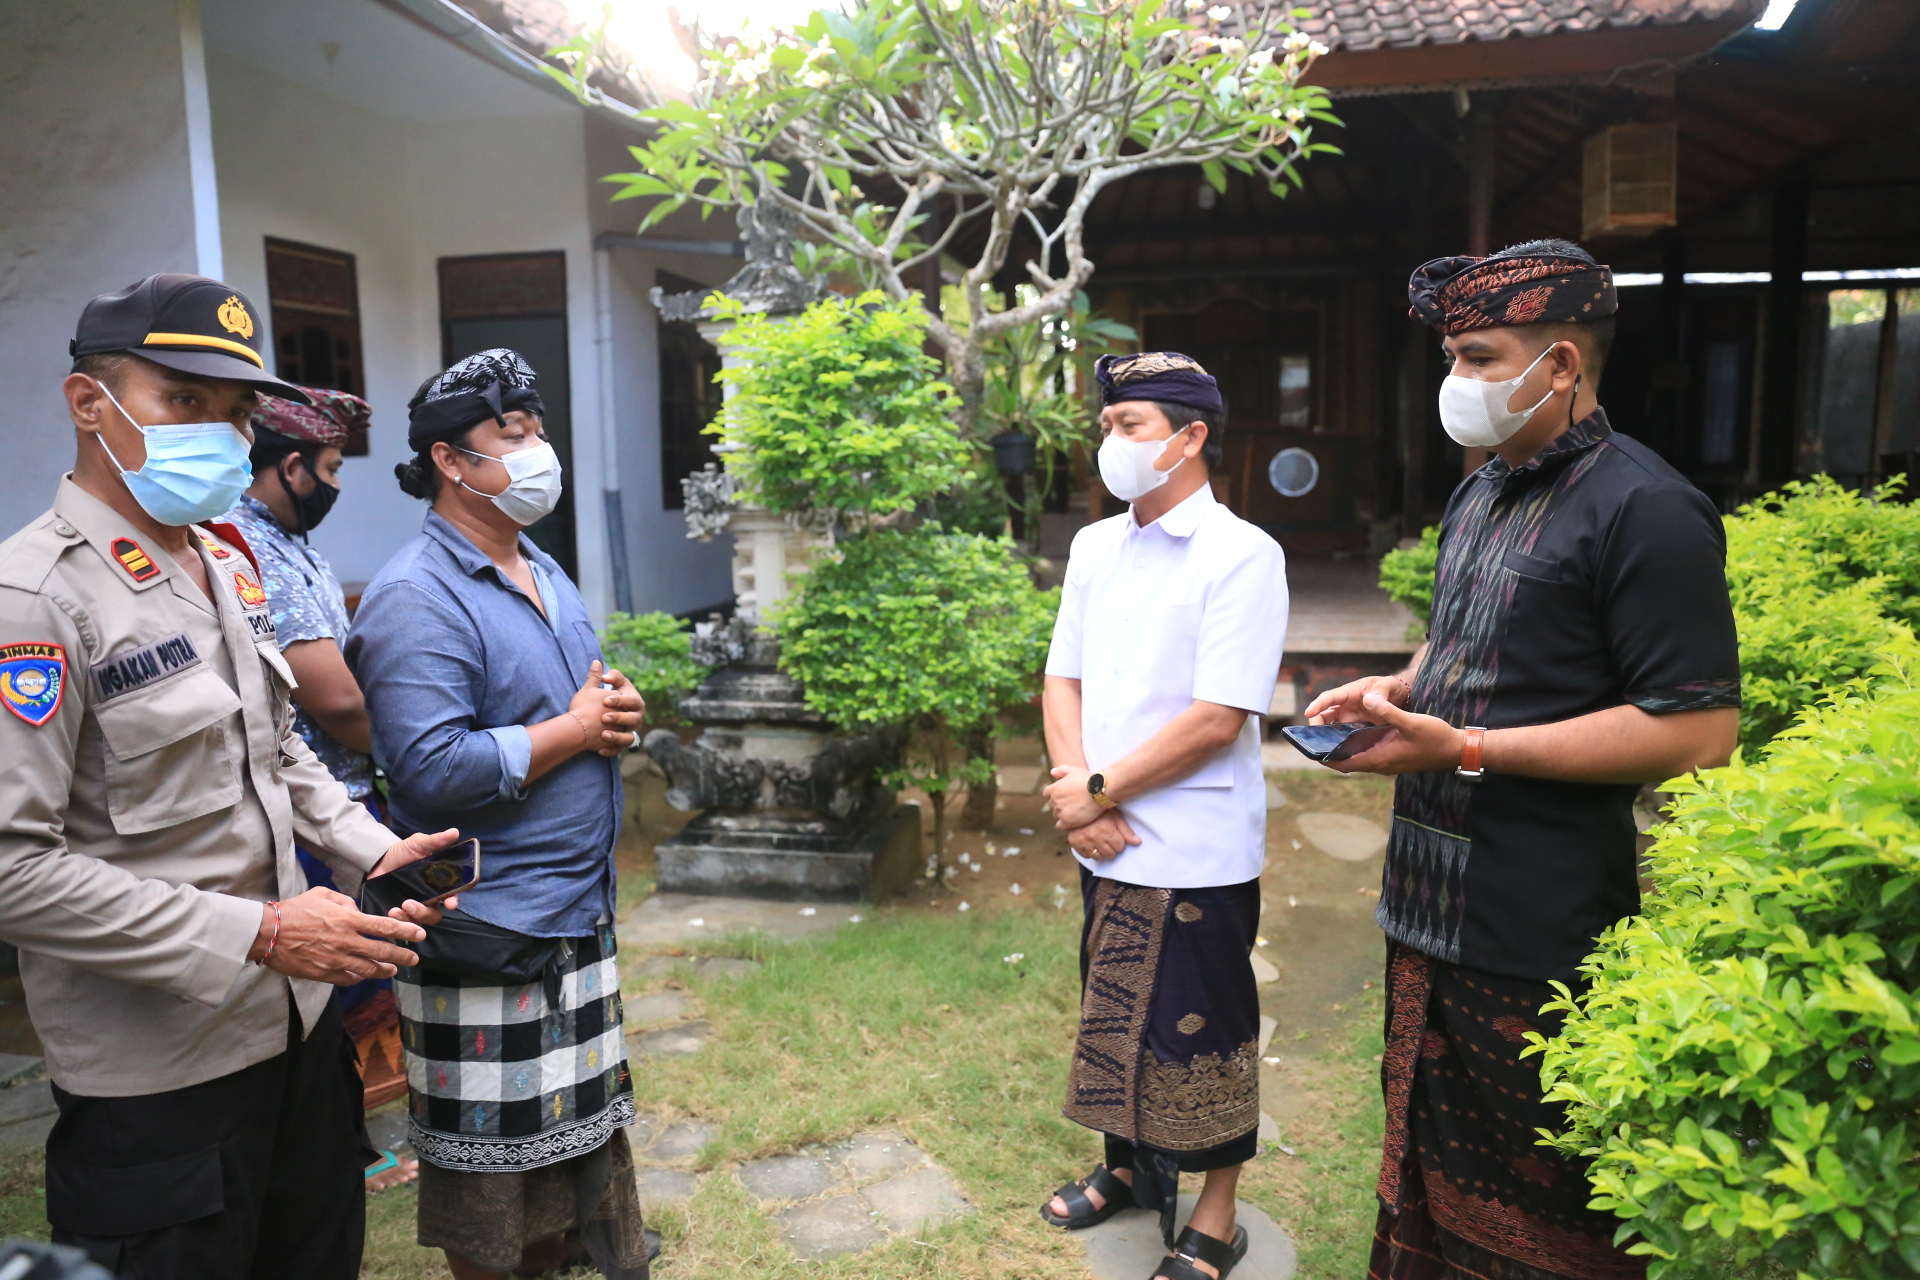 BUPATI Suwirta monitoring rencana penyiapan lokasi isolasi terpusat pasien Covid-19 di Kecamatan Nusa Penida, Minggu (15/8/2021). Foto: ist